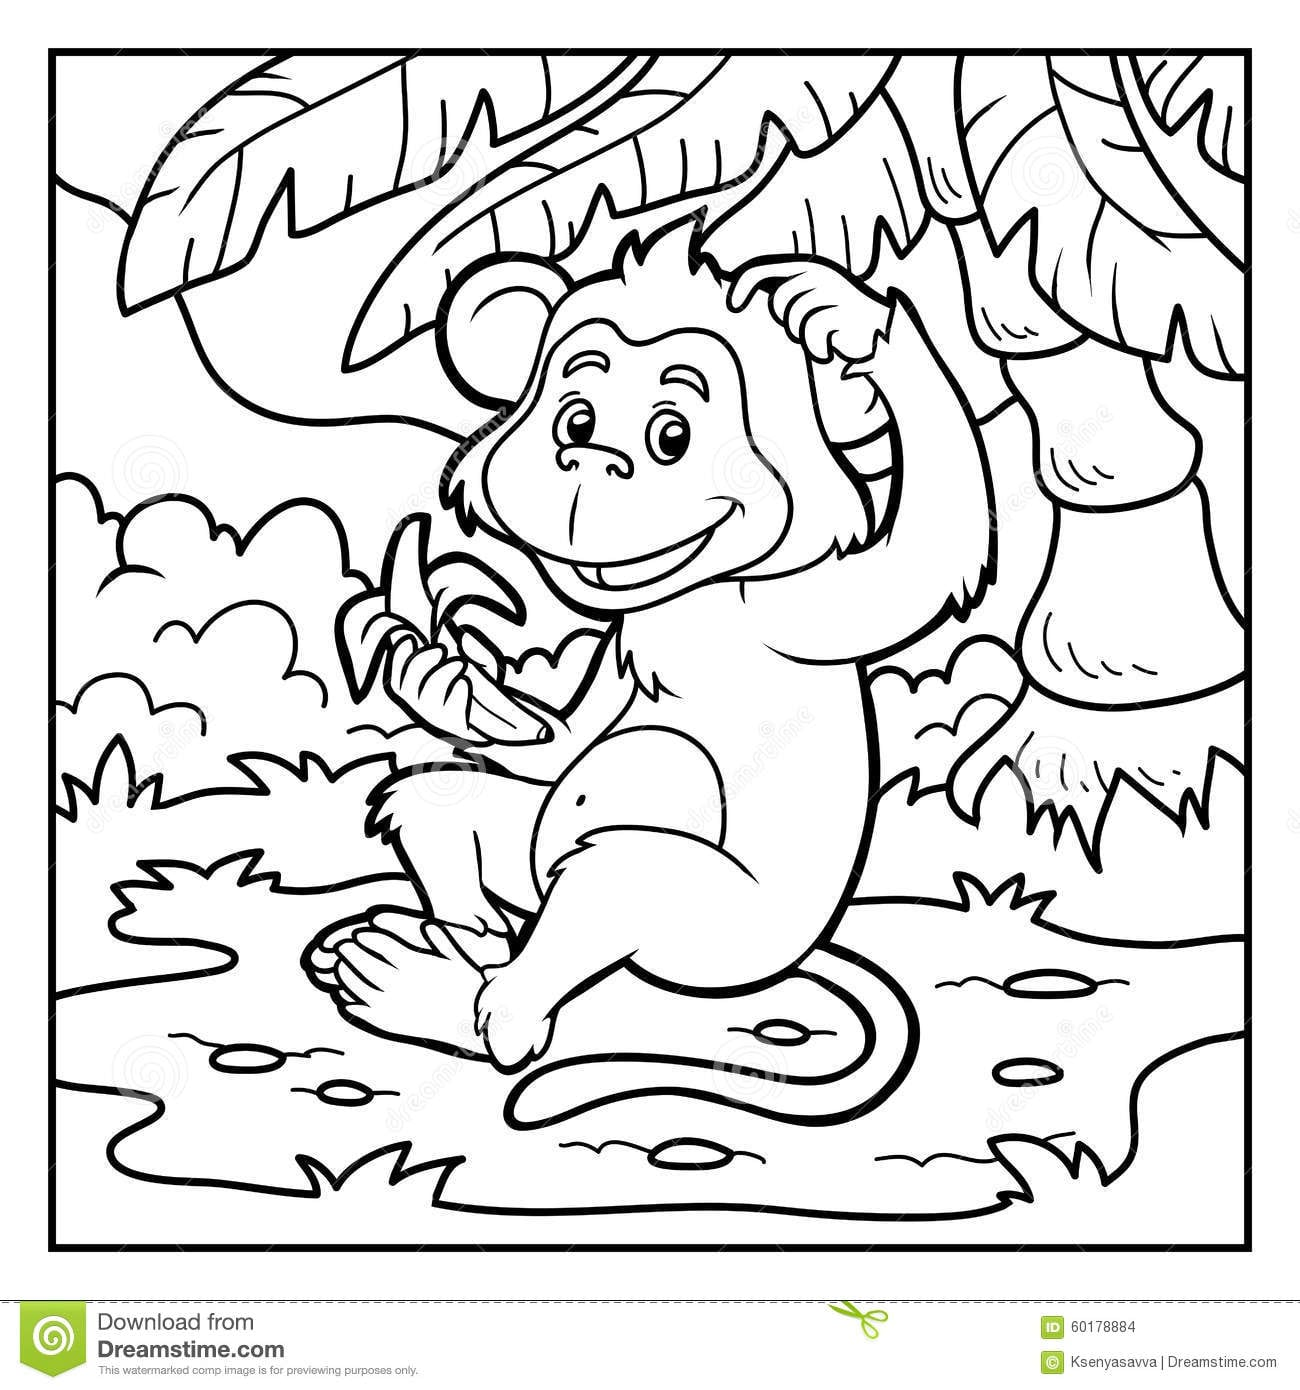 Macaco Para Colorir E Imprimir